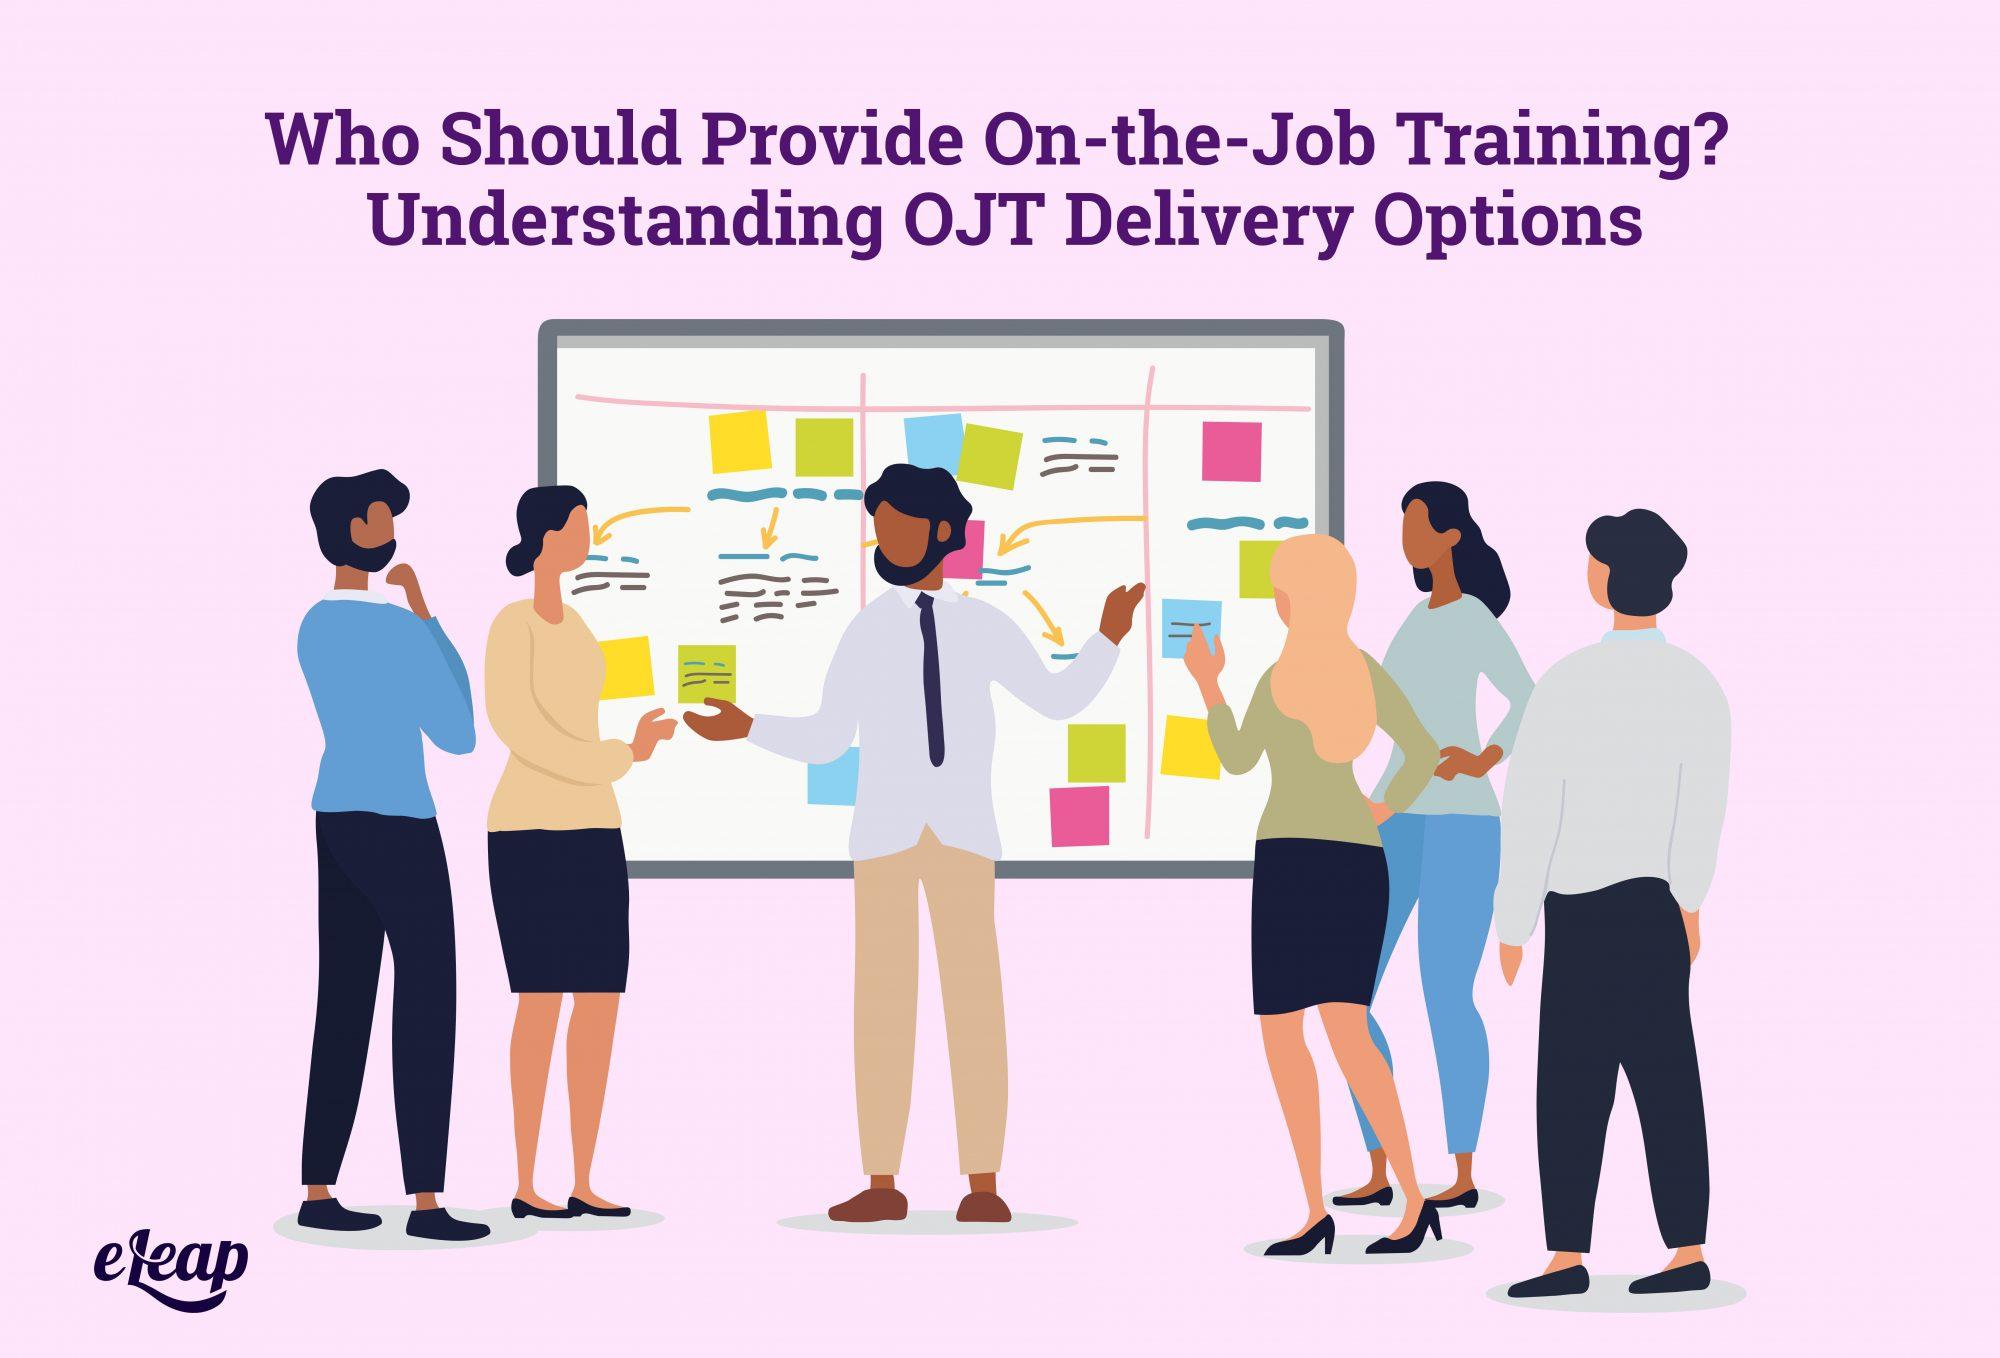 Understanding OJT Delivery Options